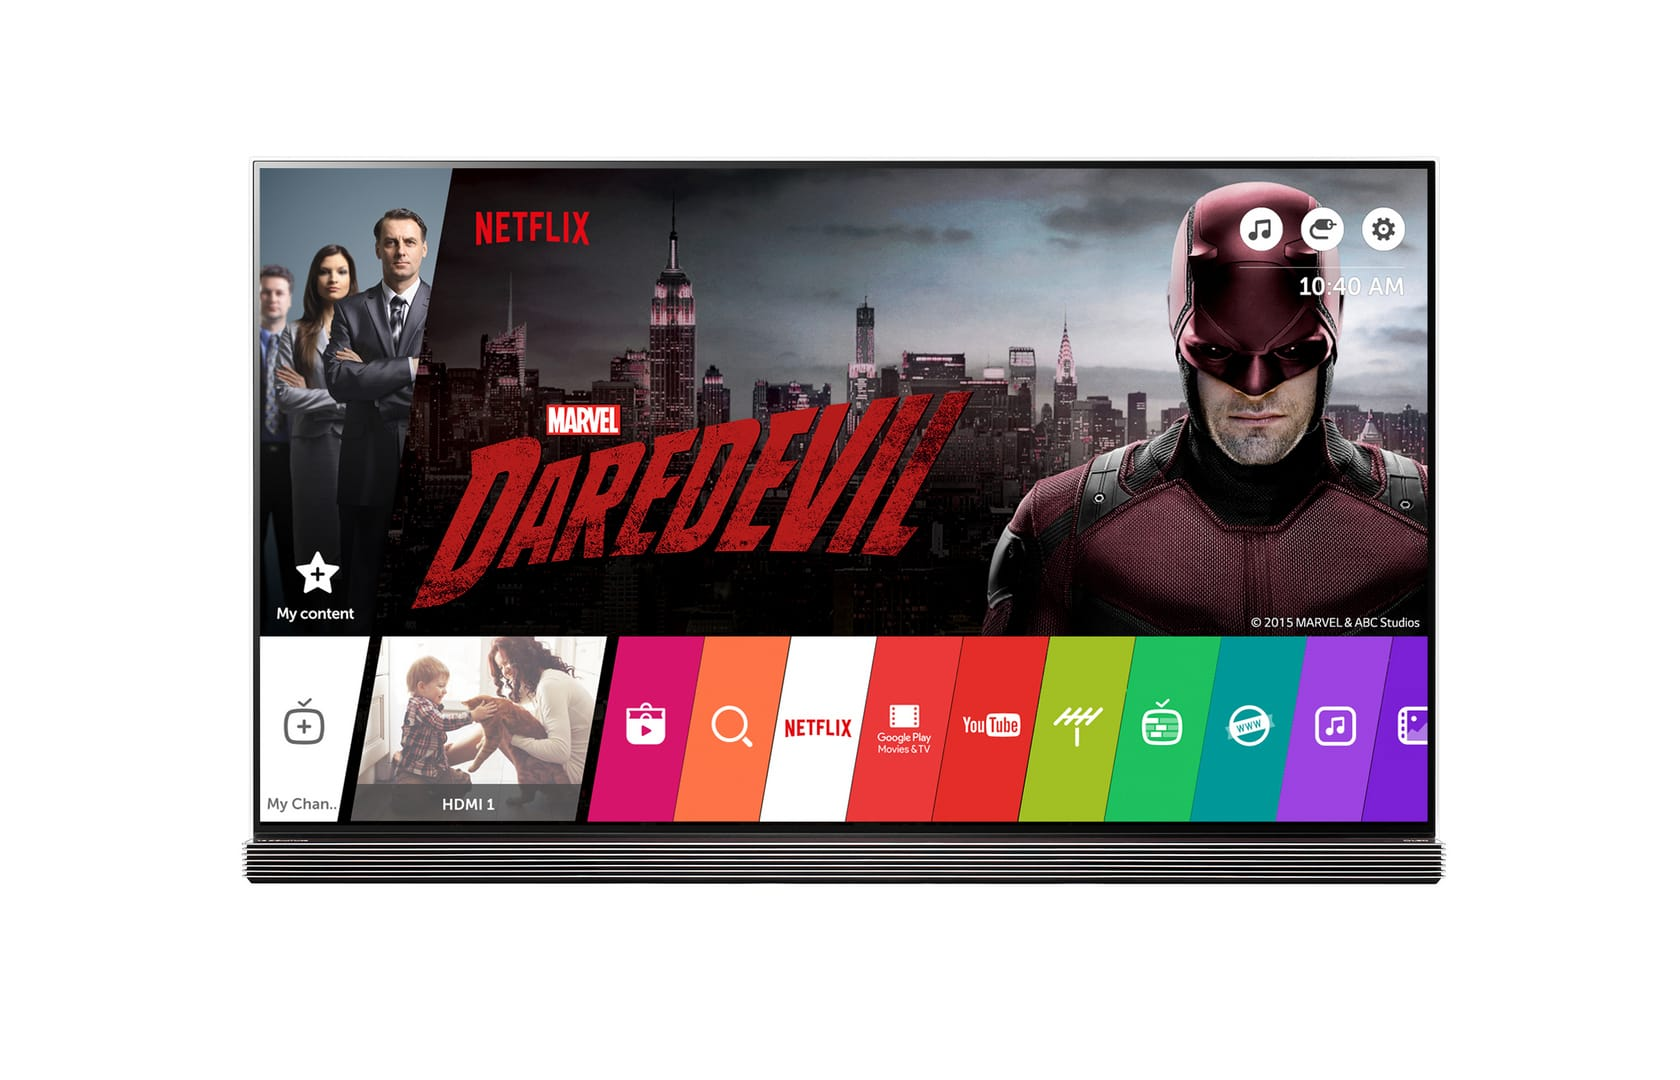 LG_Netflix